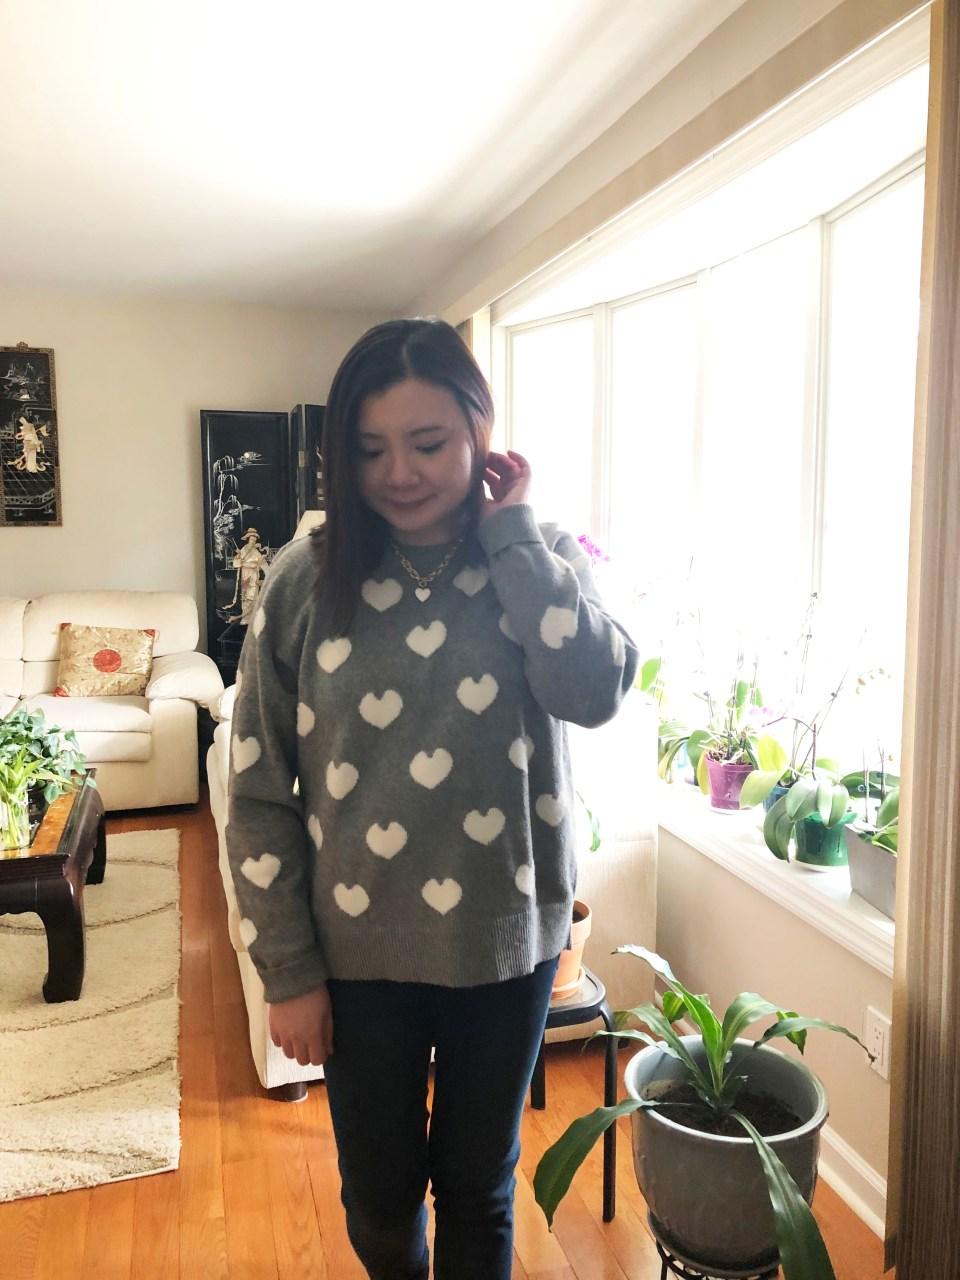 White Heart Sweater 12